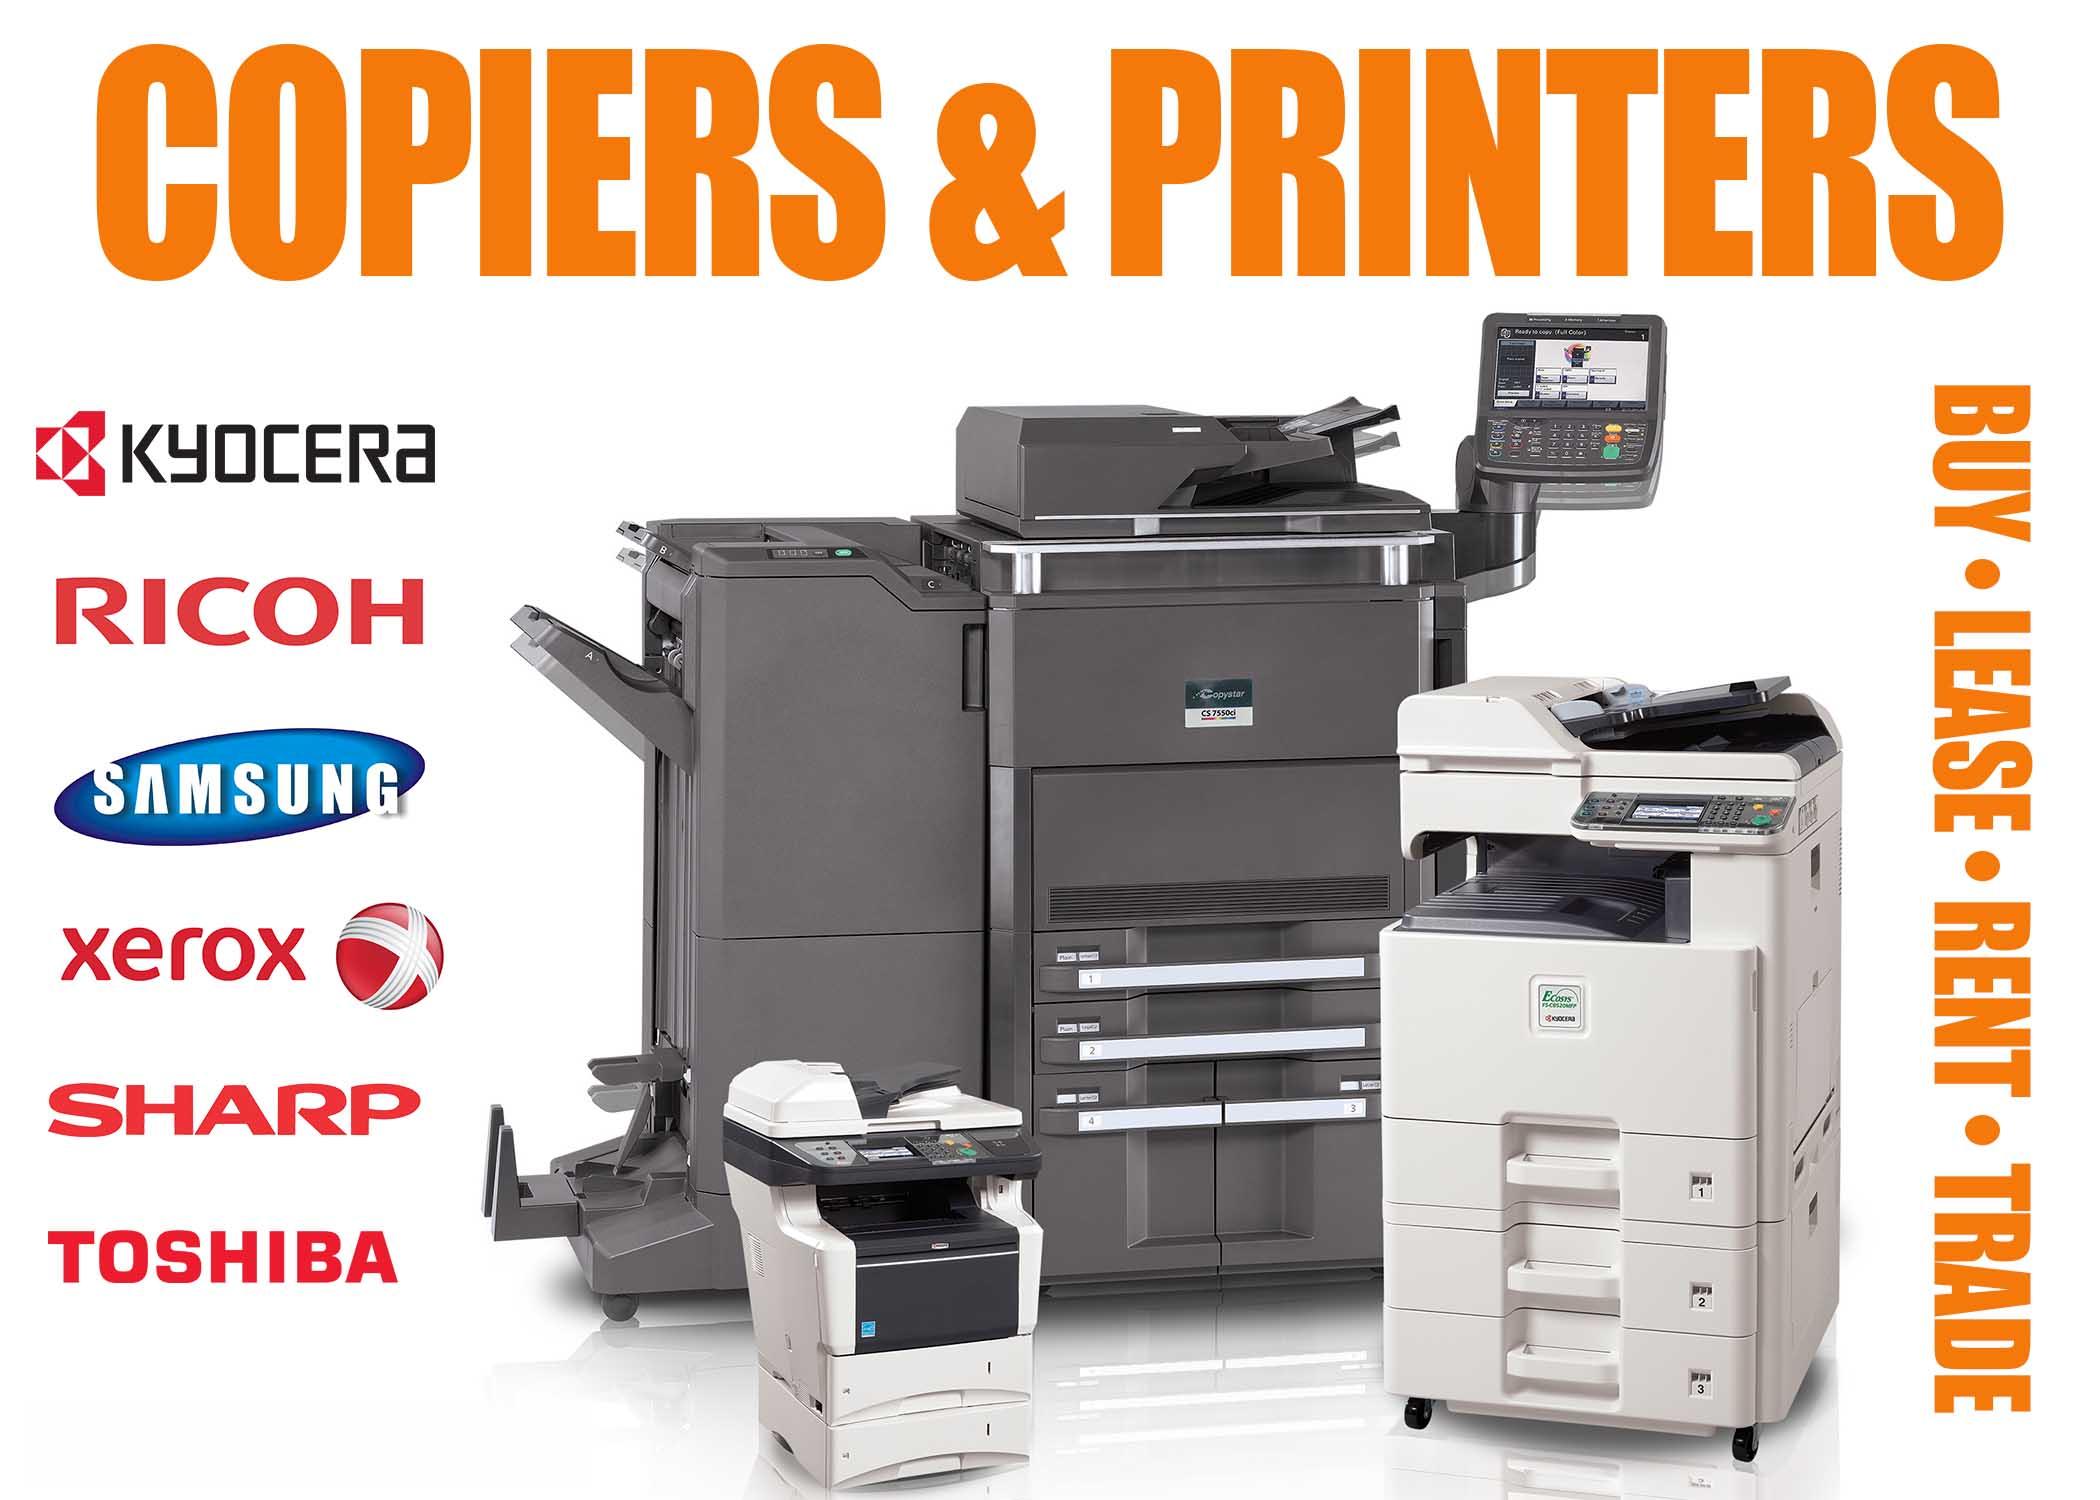 COPIERS & PRINTERS USA